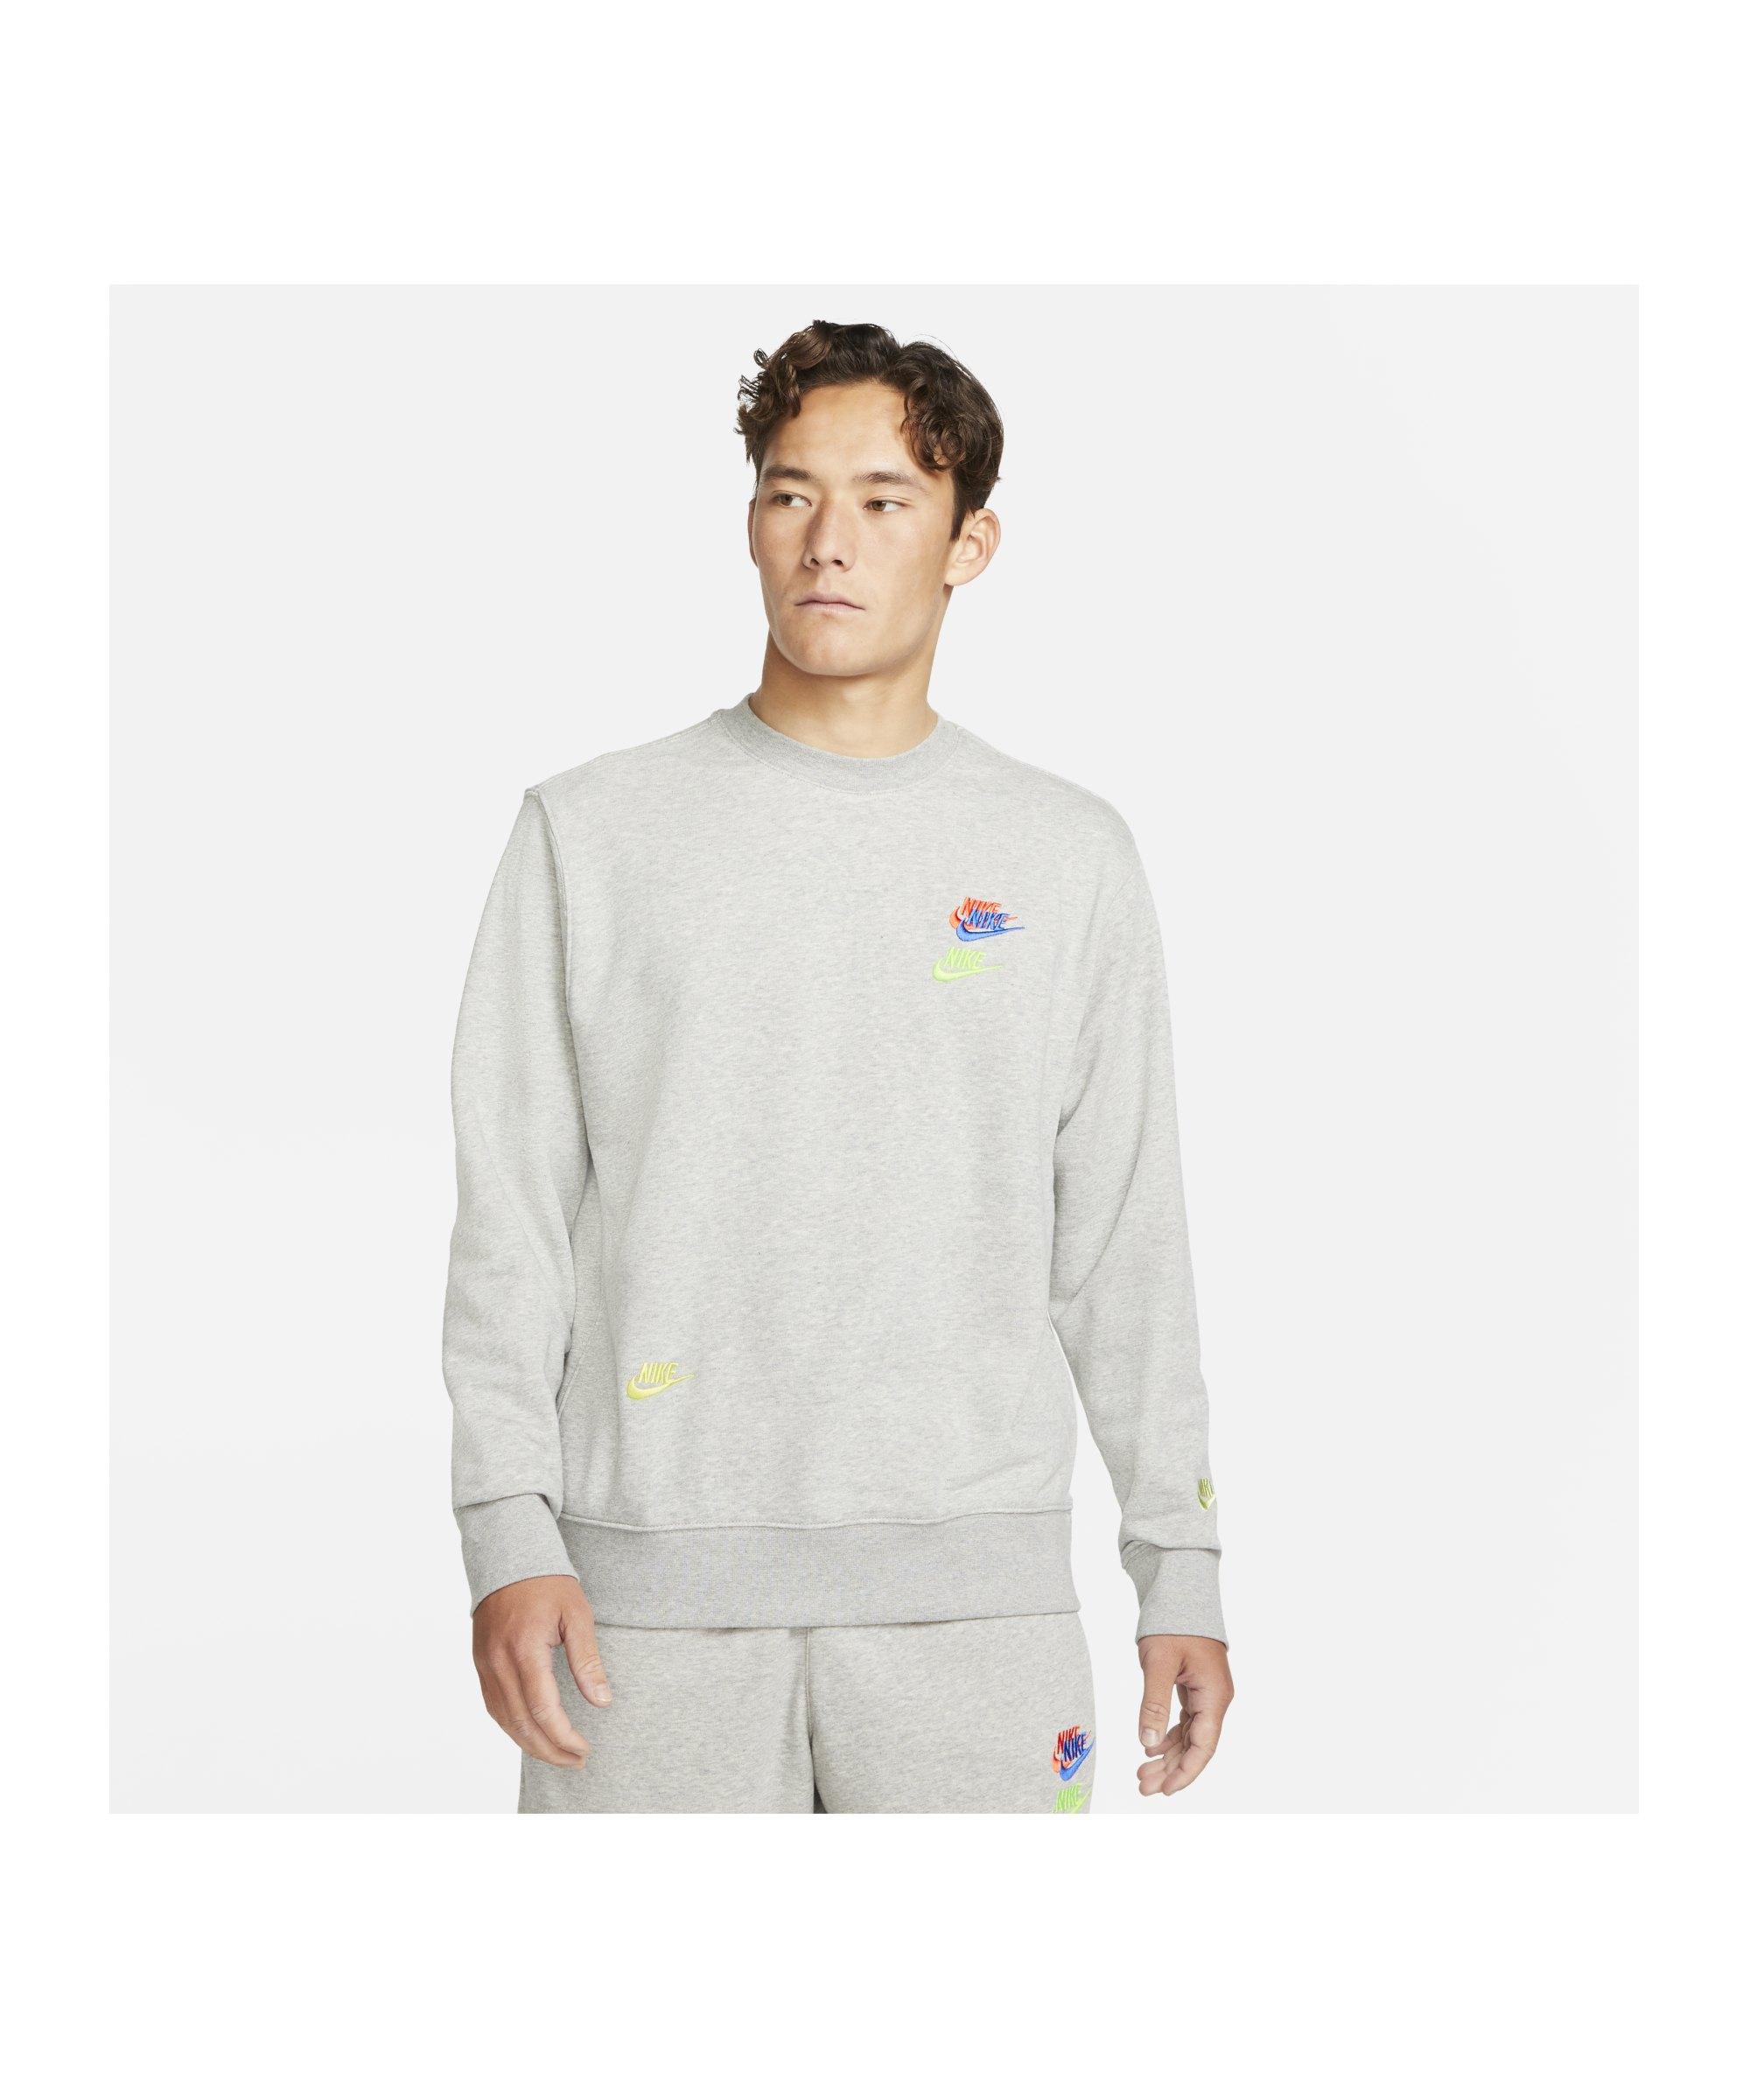 Nike Essential French Terry Crew Sweatshirt F063 - grau